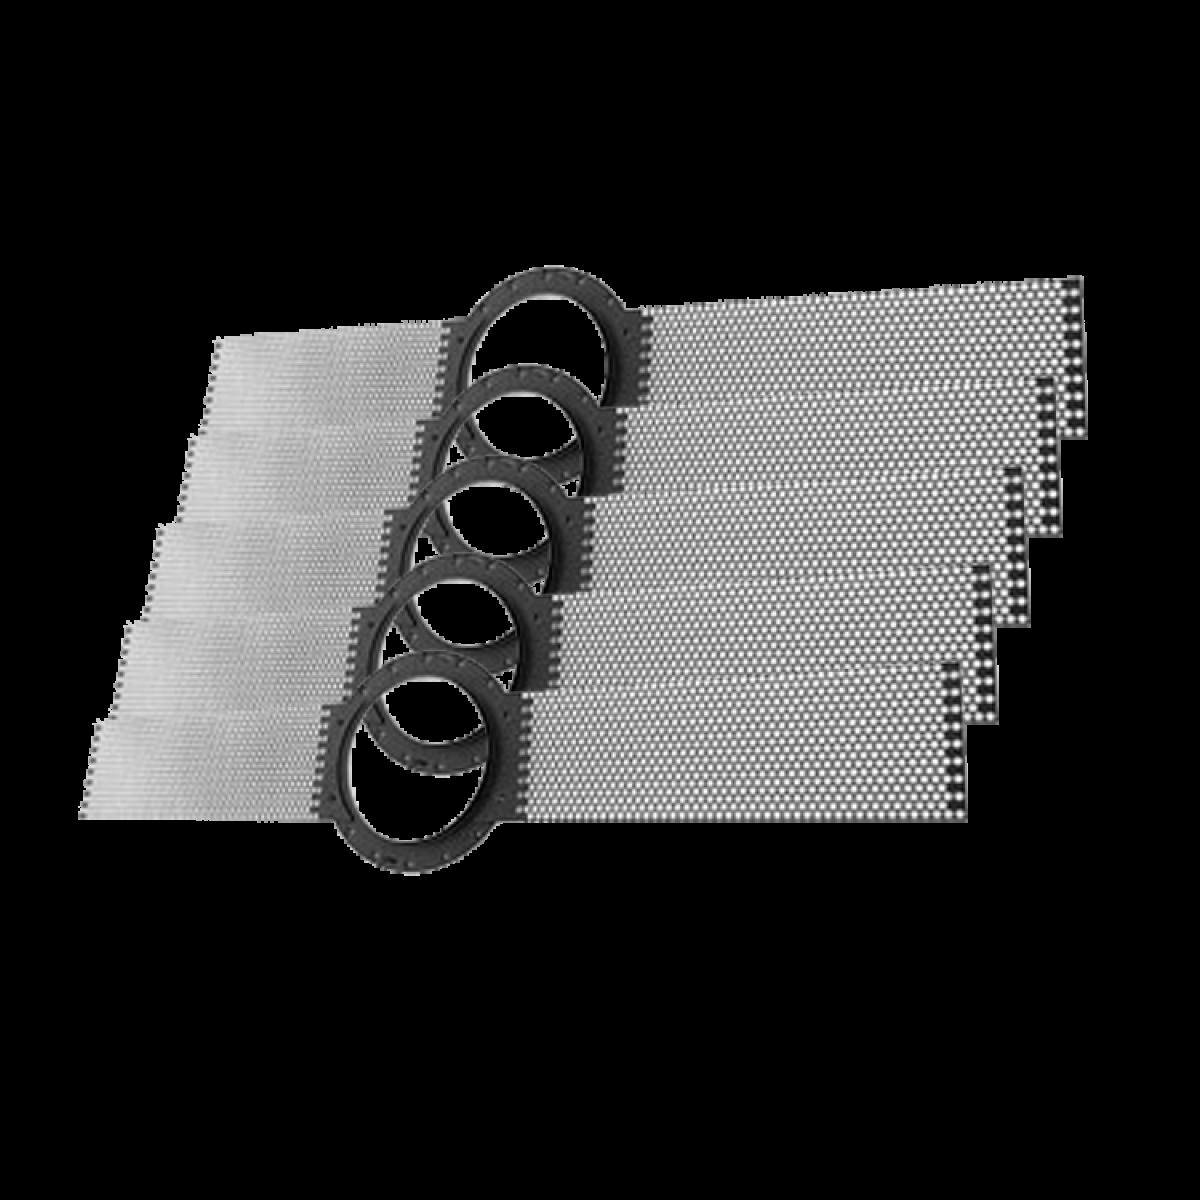 CS-PI-10P Ceiling Pre-Install Tilebridge (10 Pack)